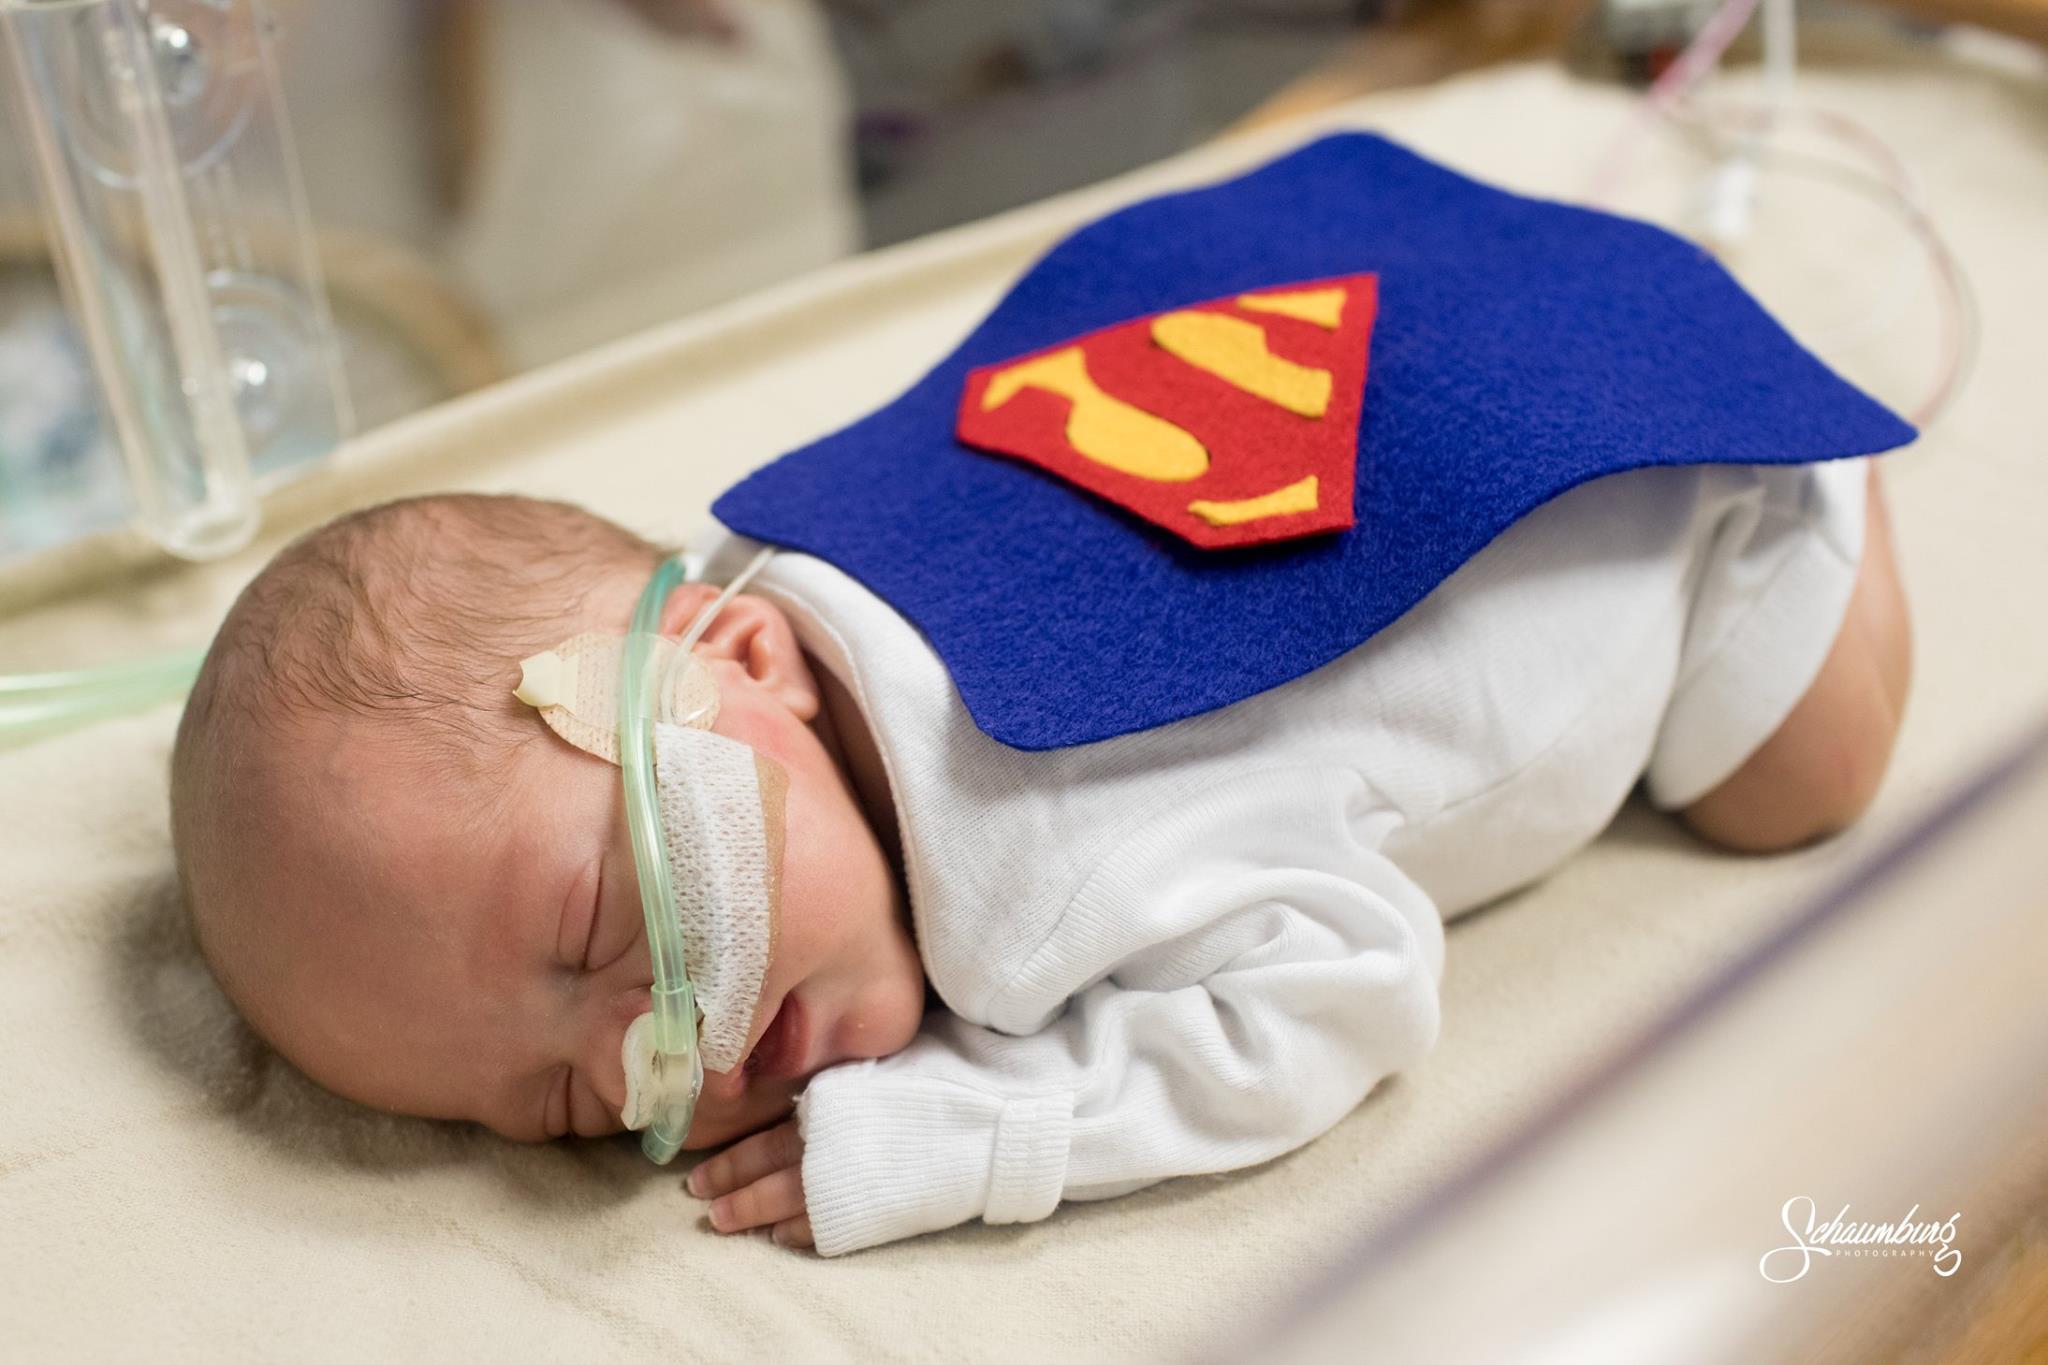 Nurse dress babies in superhero costumes